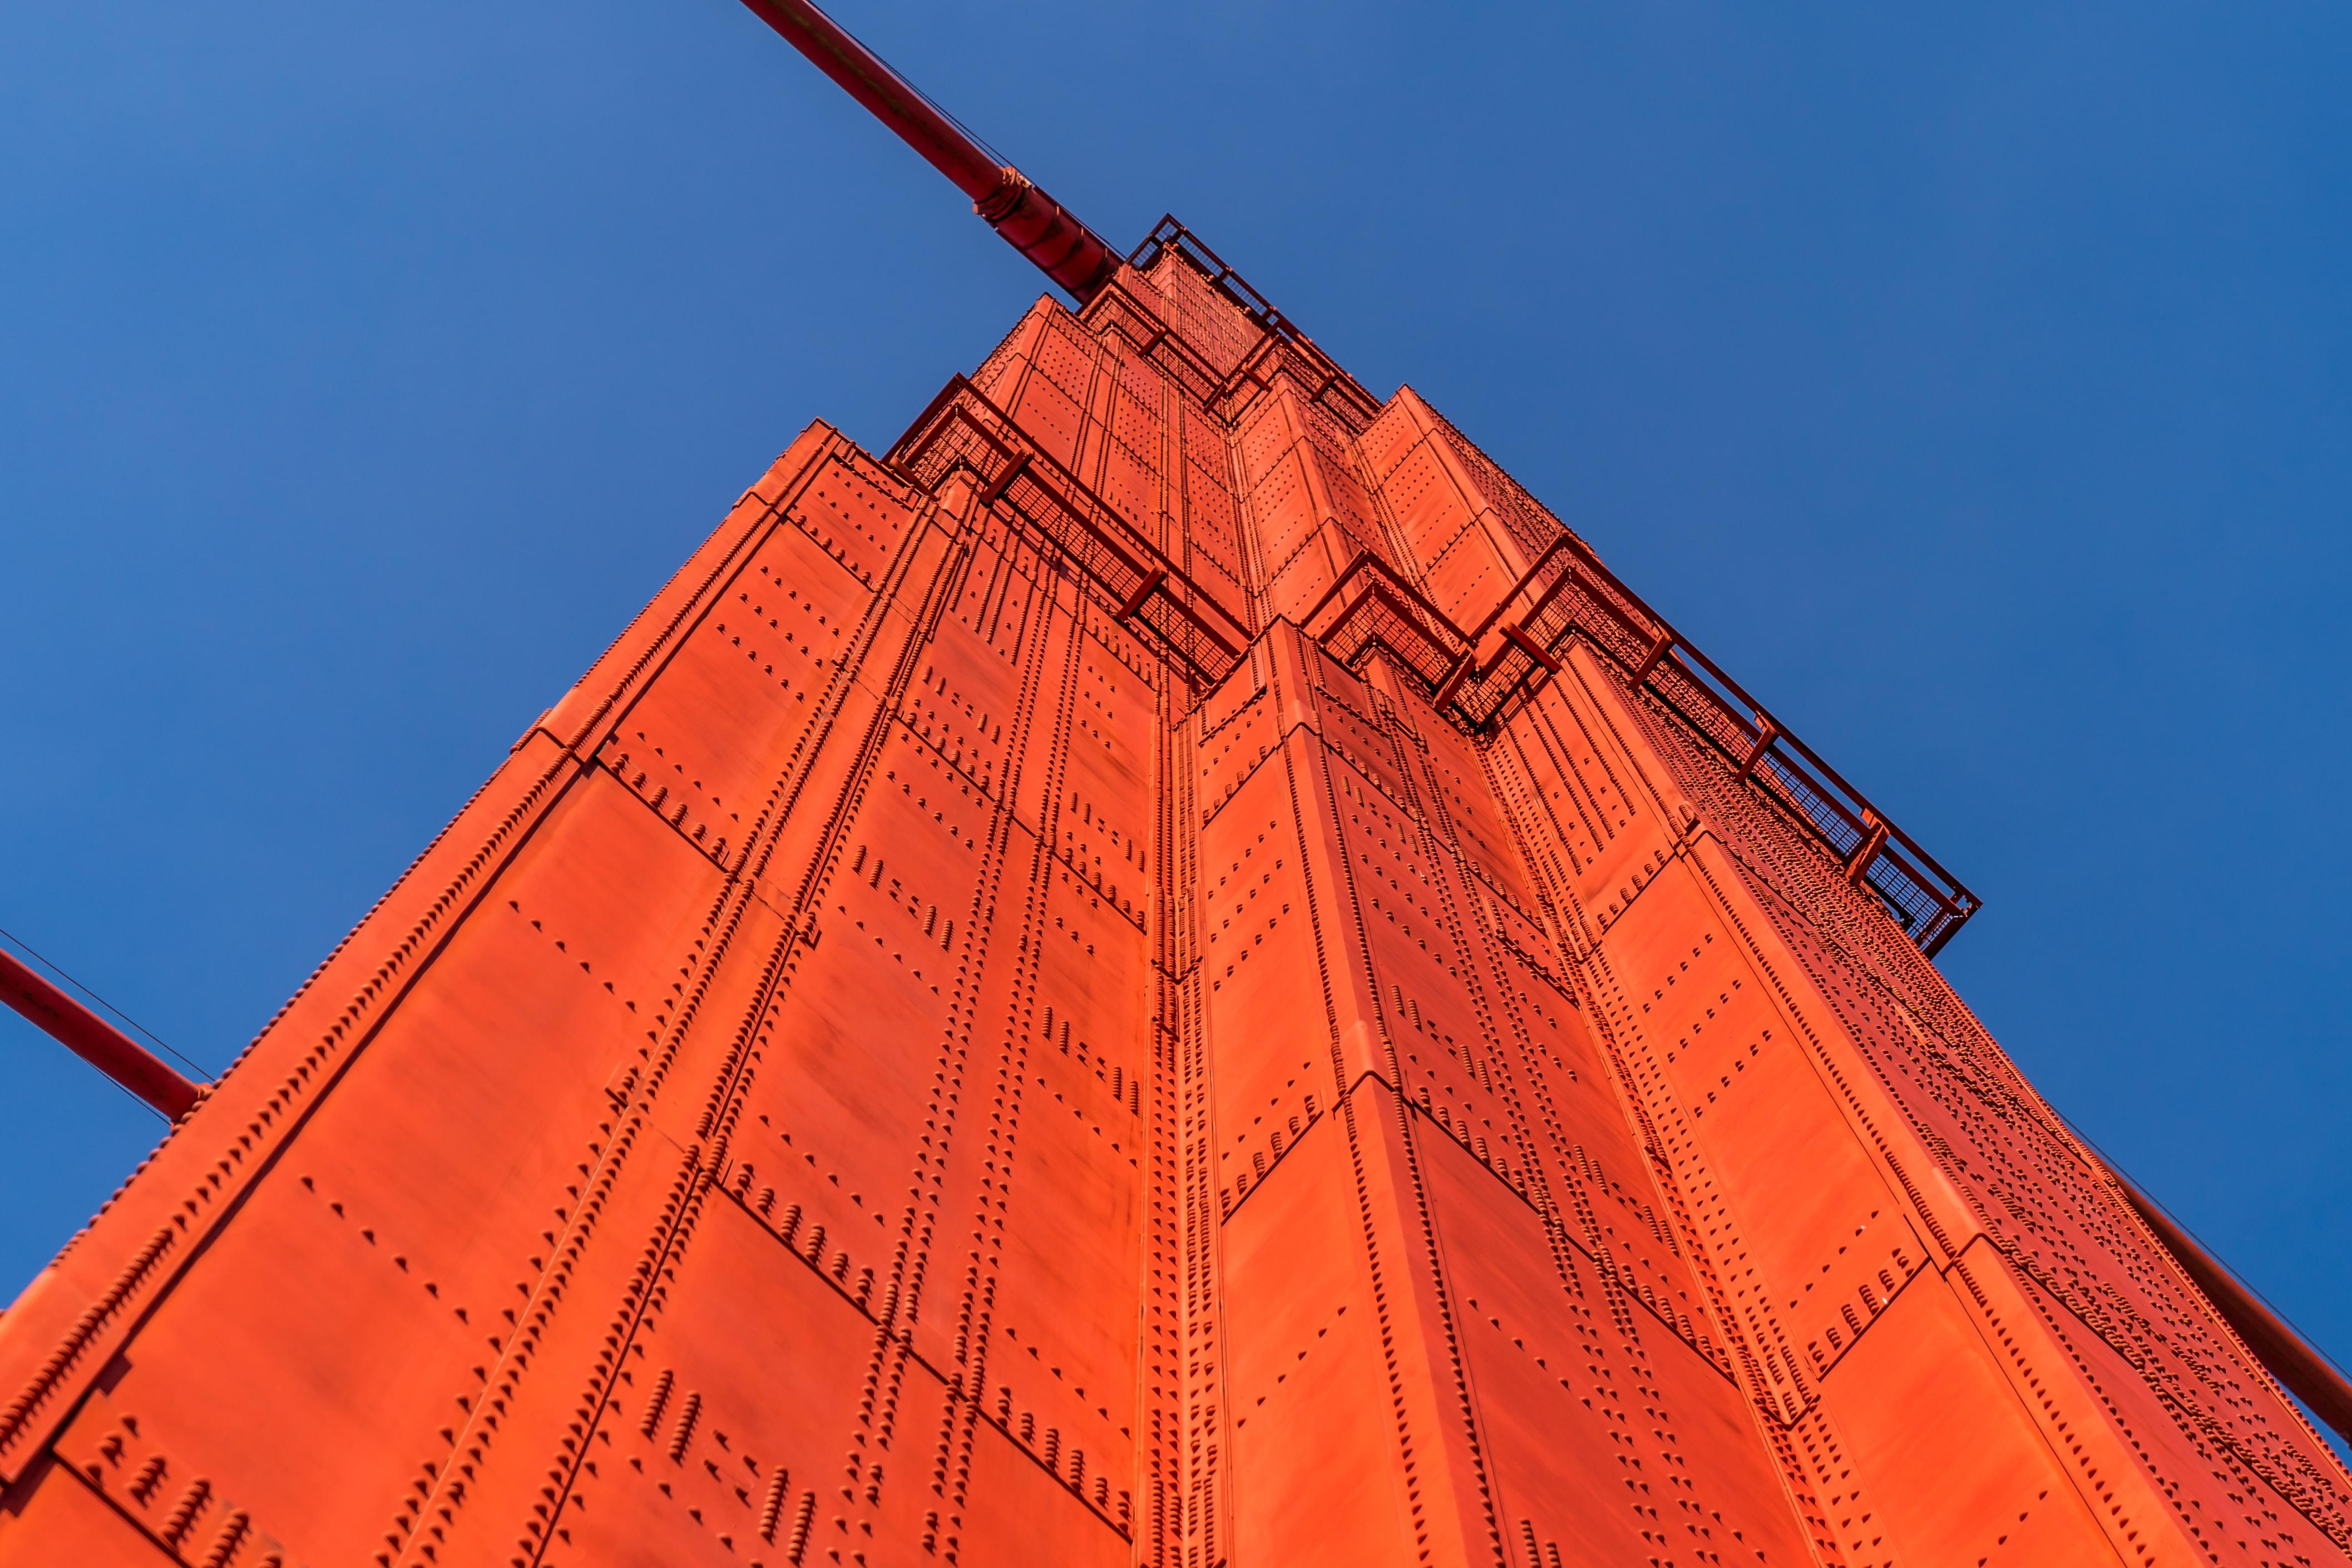 orange building low angle photography